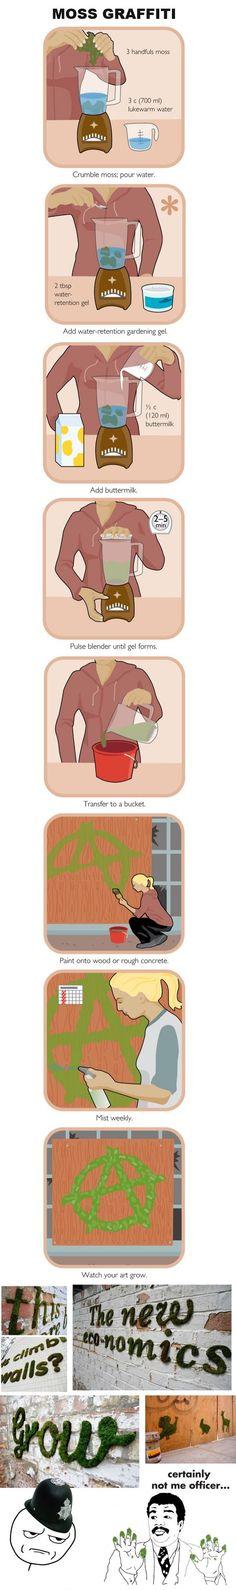 tagging like a gardener